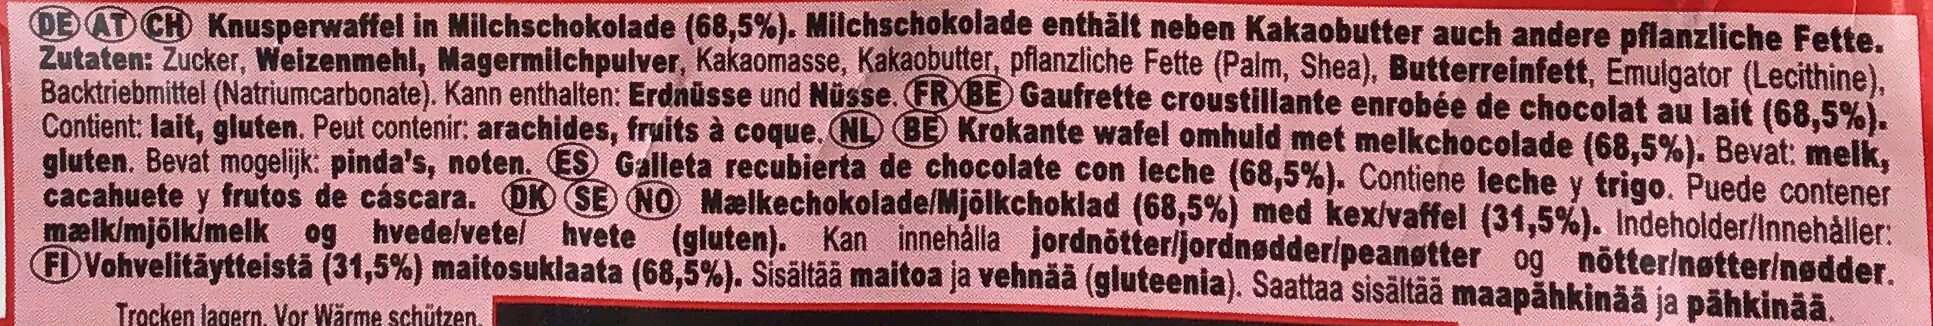 KitKat Chunky - Ingredients - de